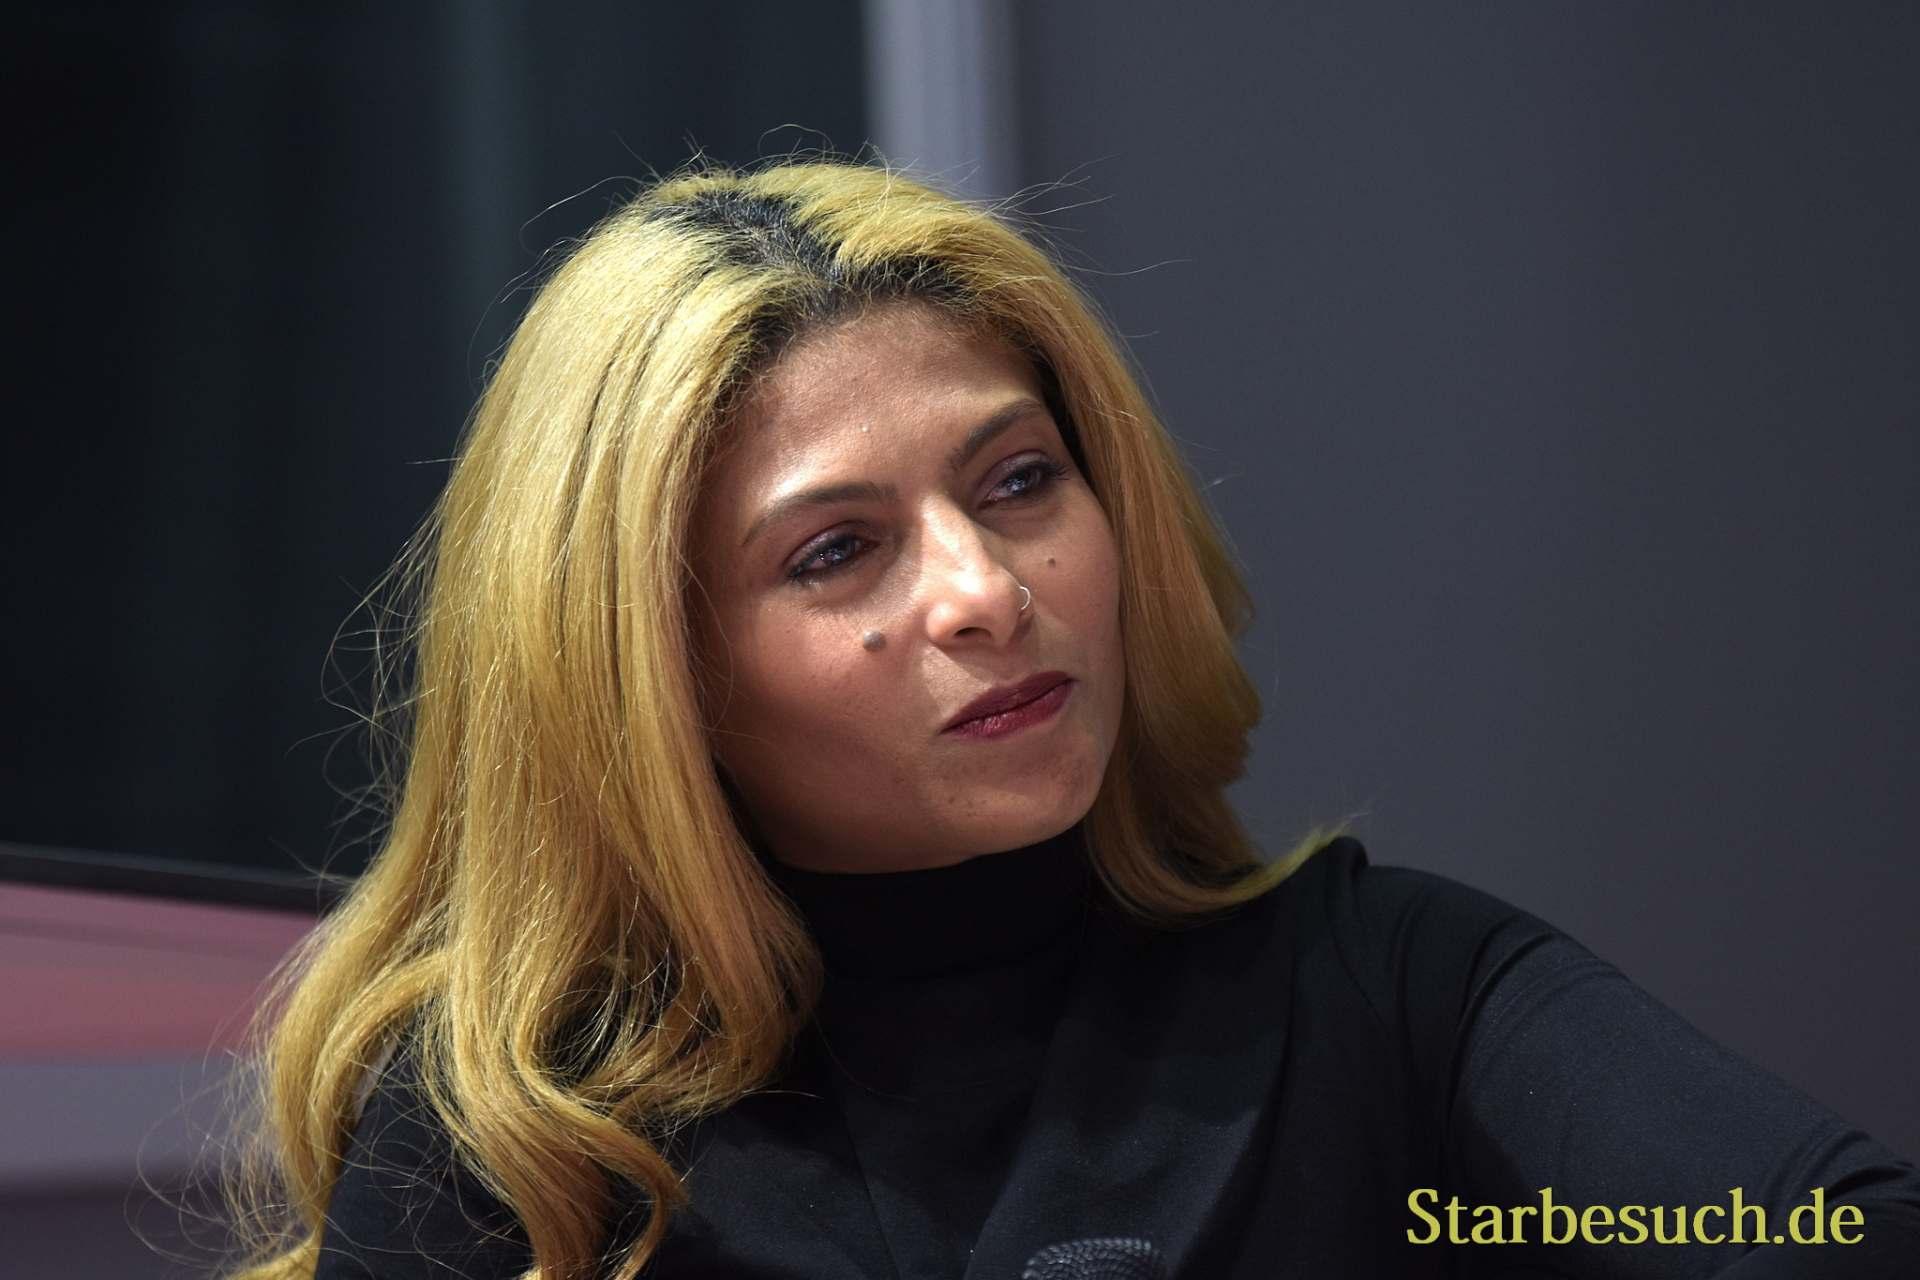 Ensaf Haidar, Frau des inhaftierten Journalisten Raif Badawi